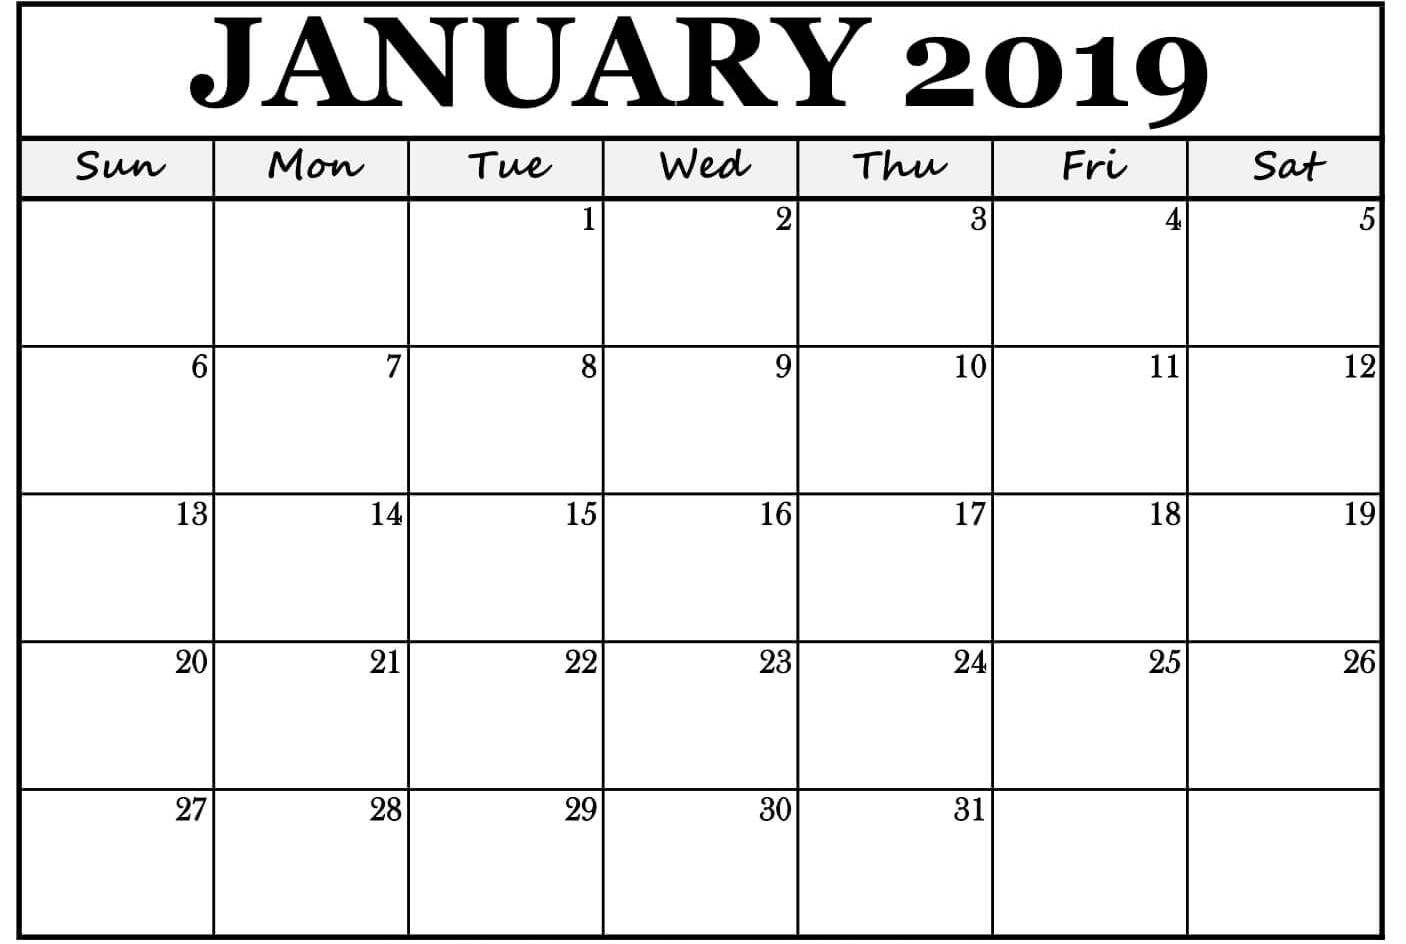 Print January 2019 Calendar PDF